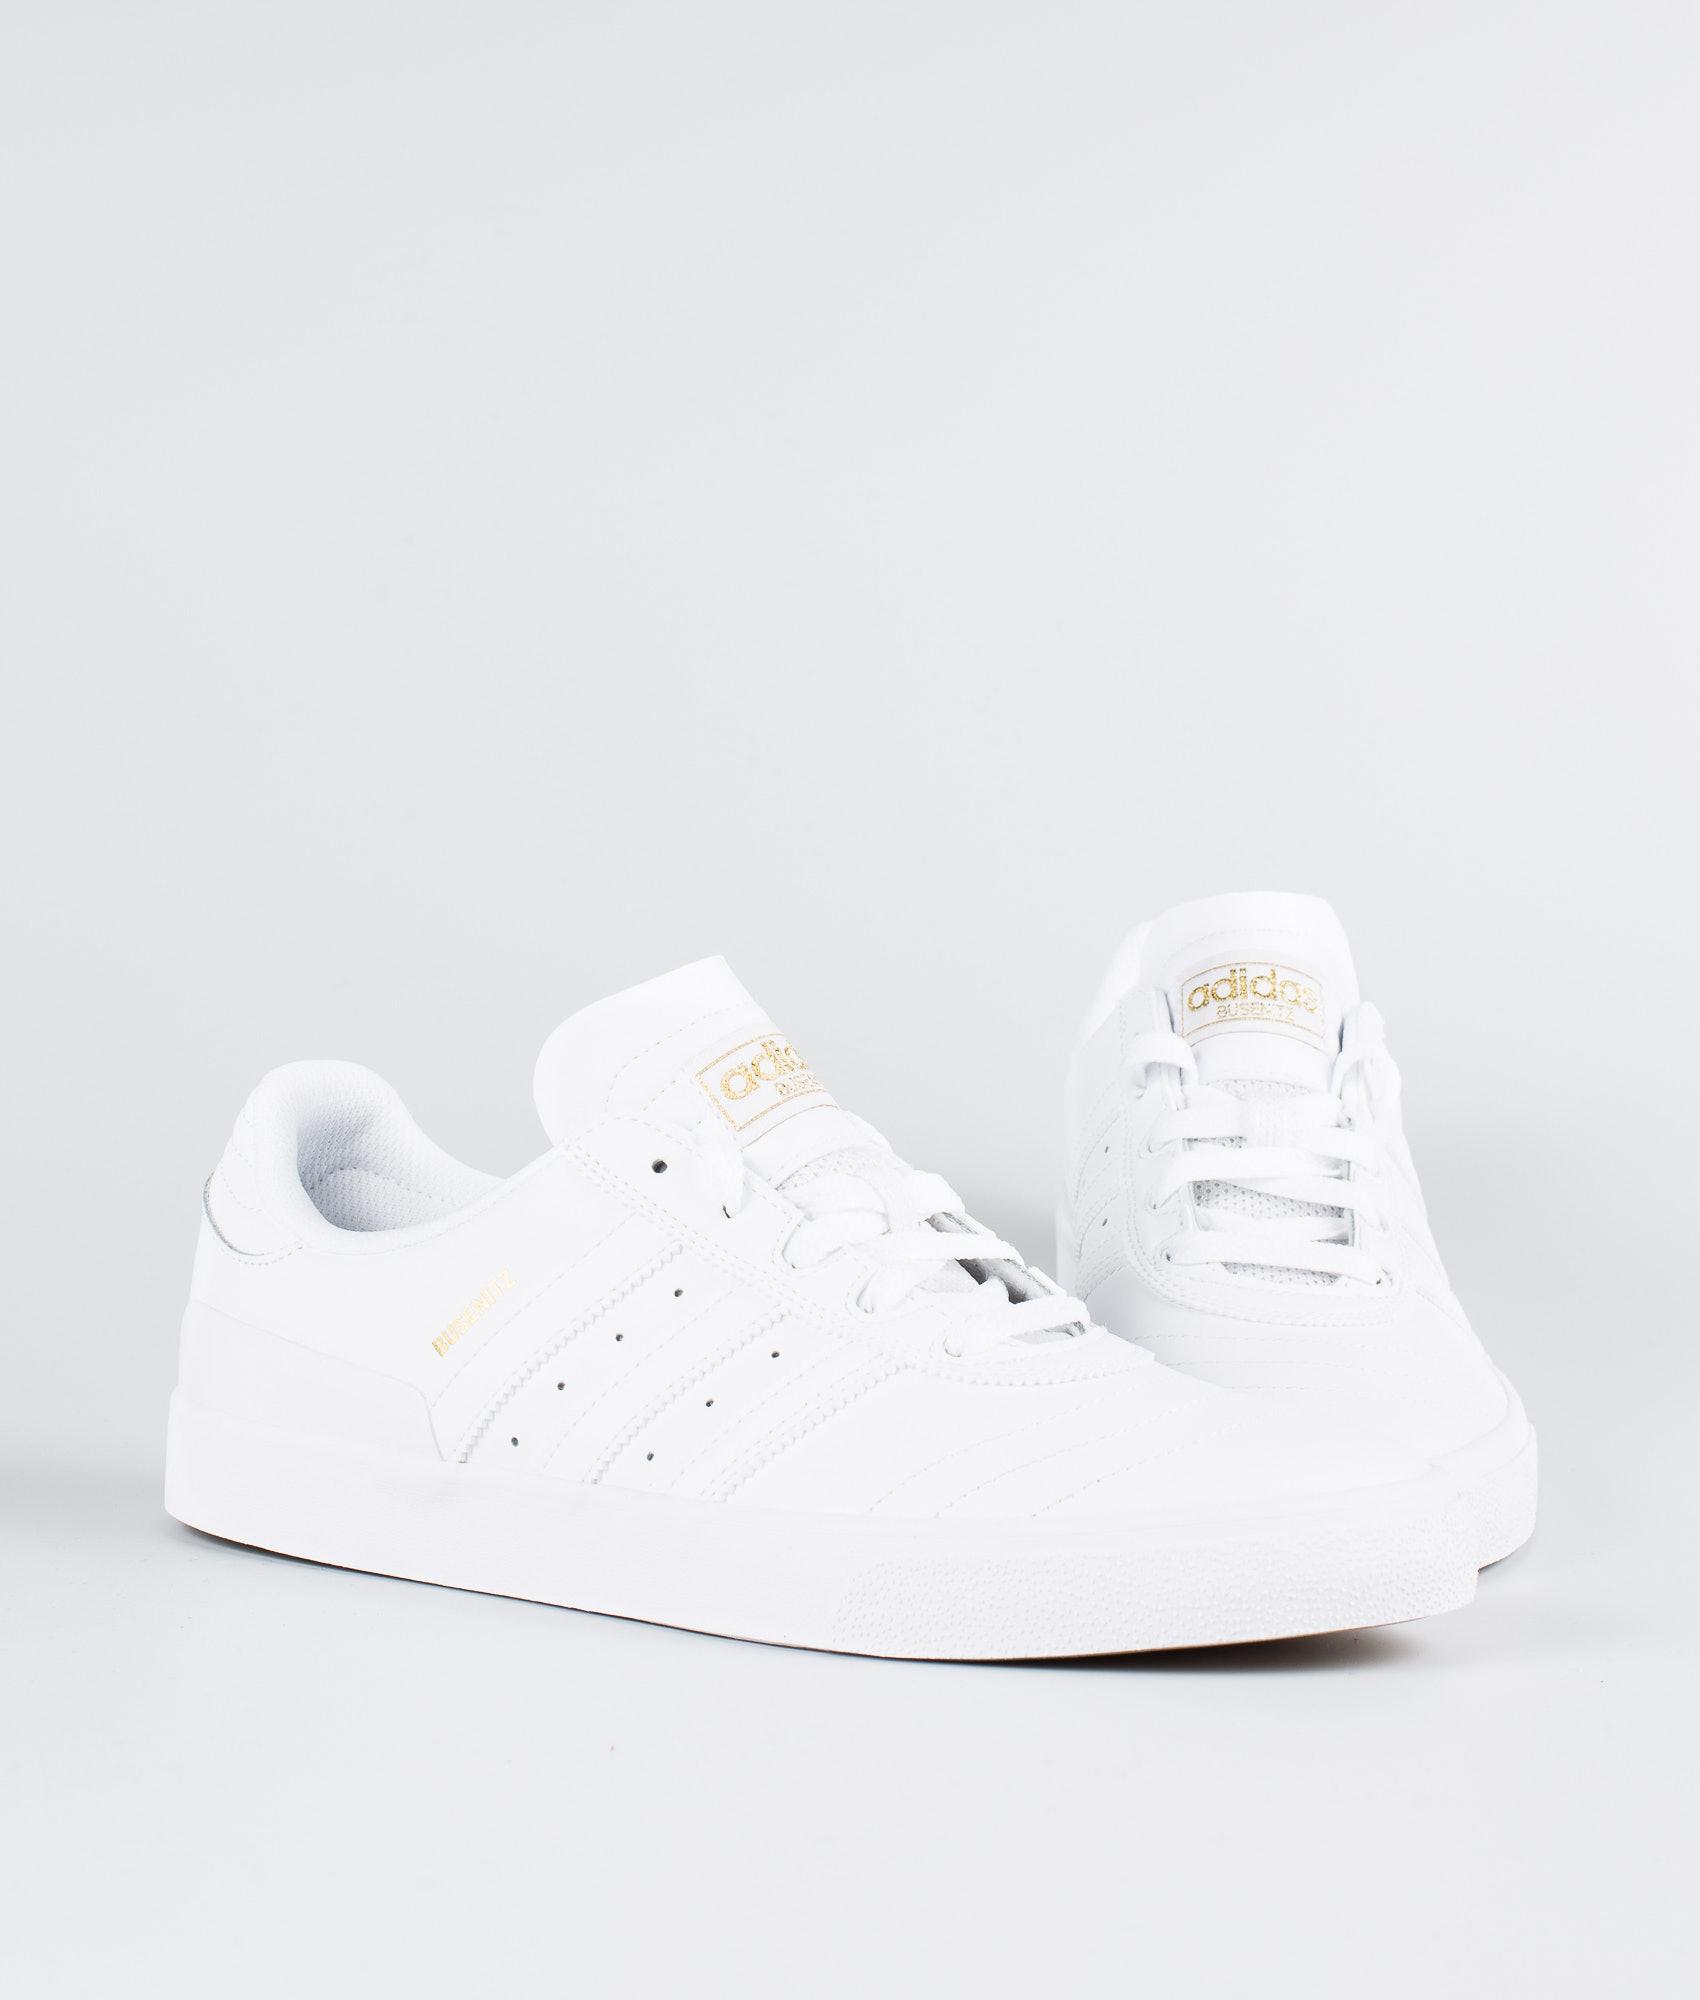 new styles da39d 954c9 Adidas Skateboarding Busenitz Vulc Schuhe